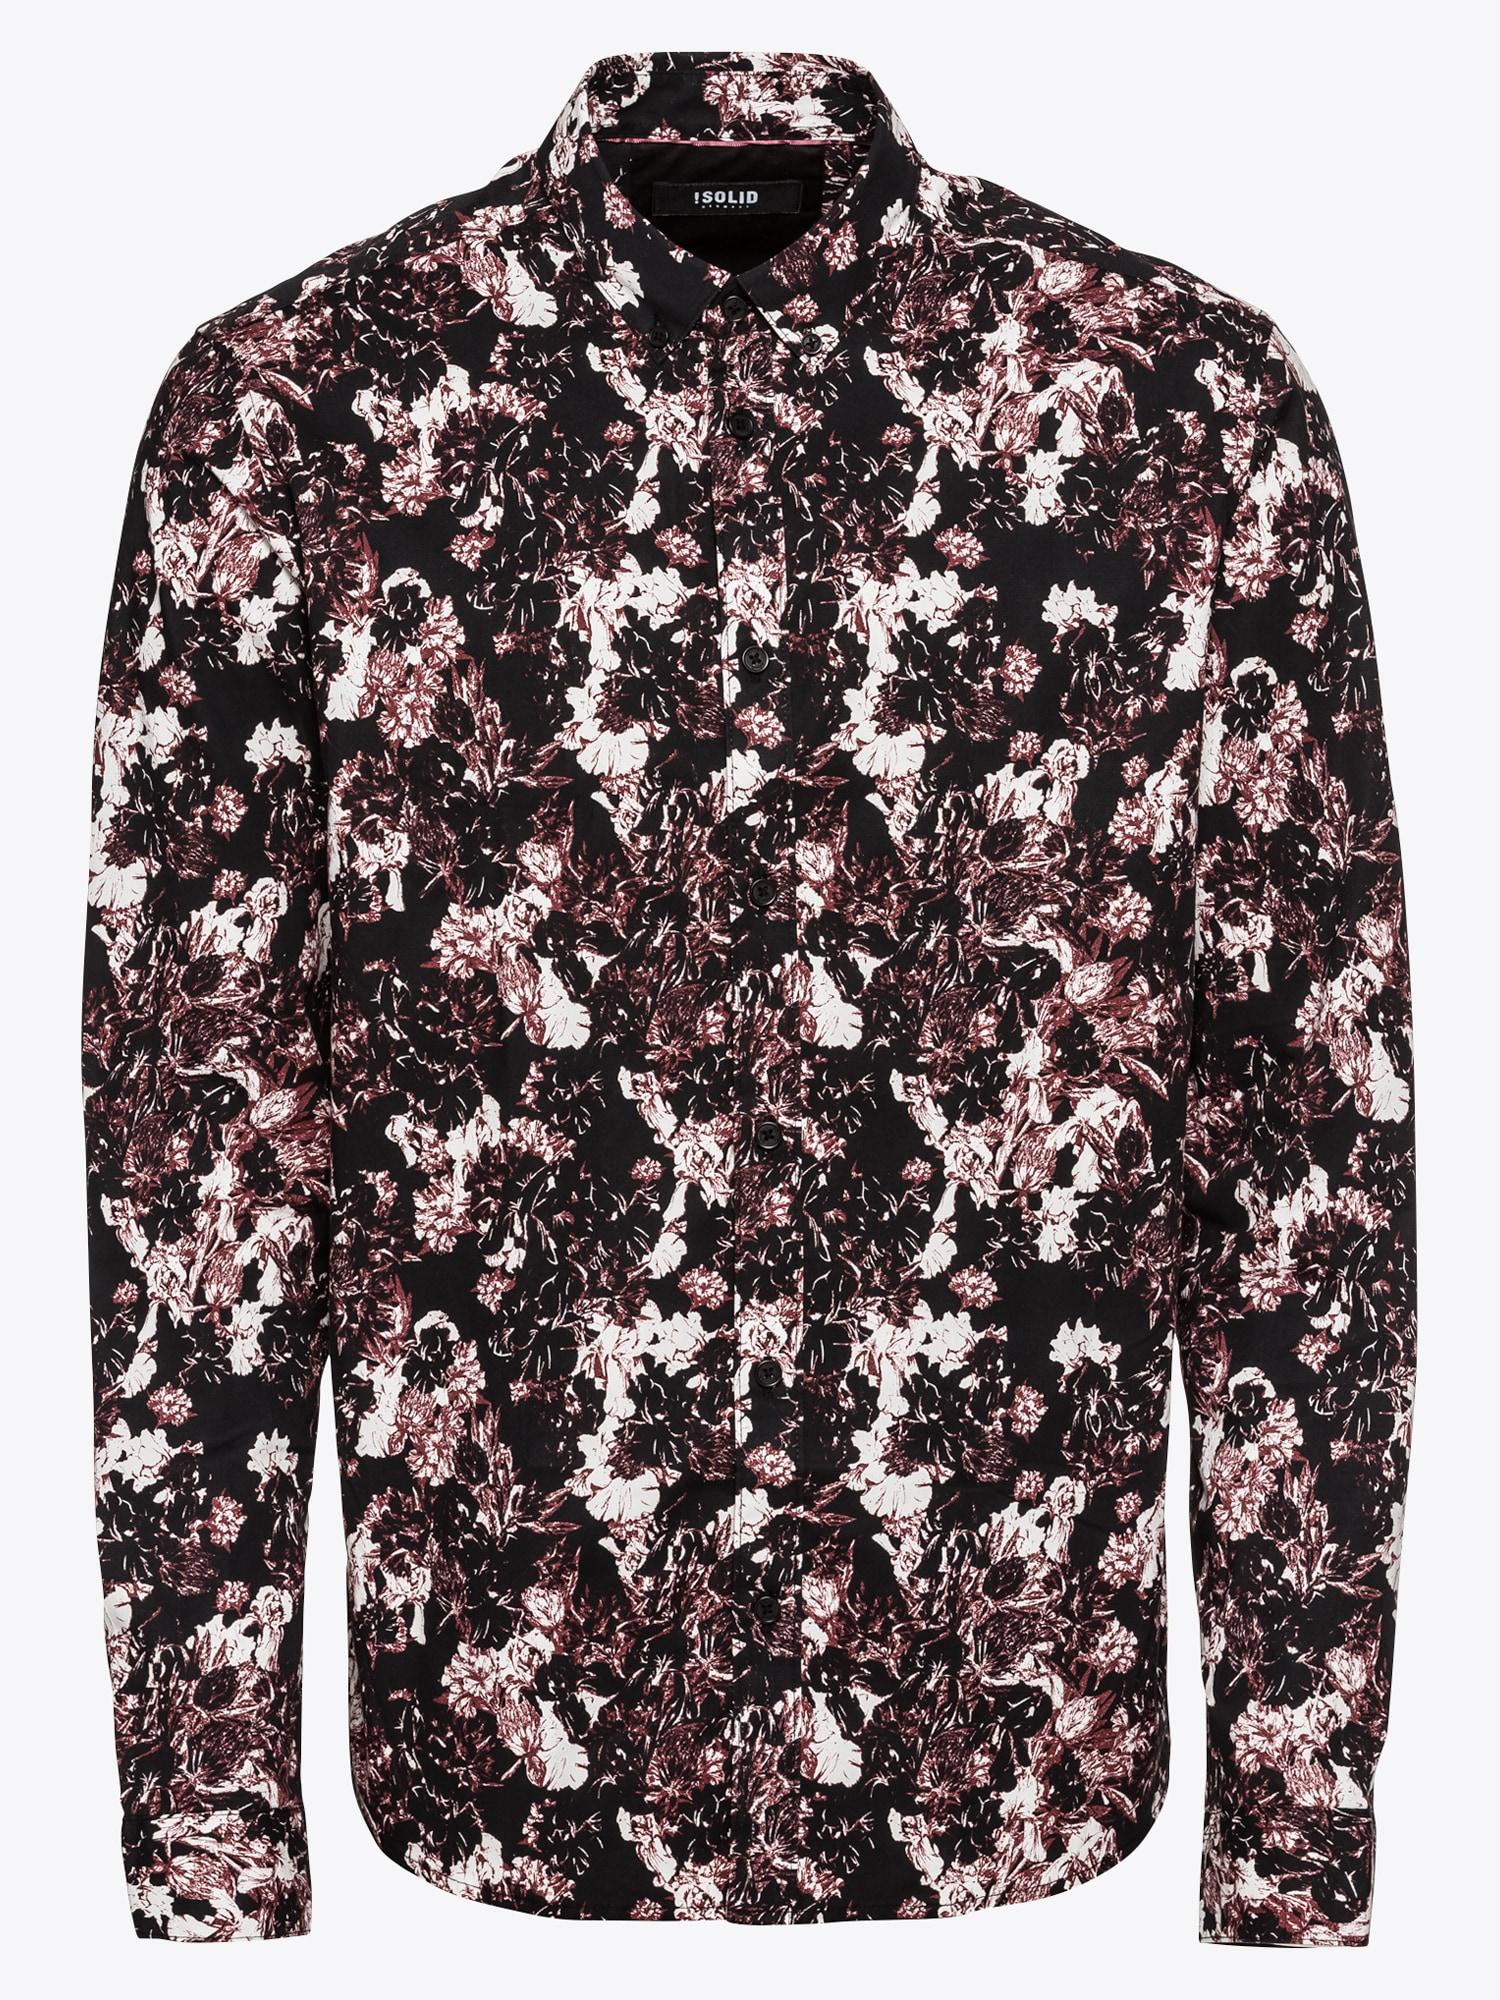 Heren Overhemd Zwart.Solid Heren Overhemd Shirt Juan Flower 3 Rood Zwart Wit Shop Via